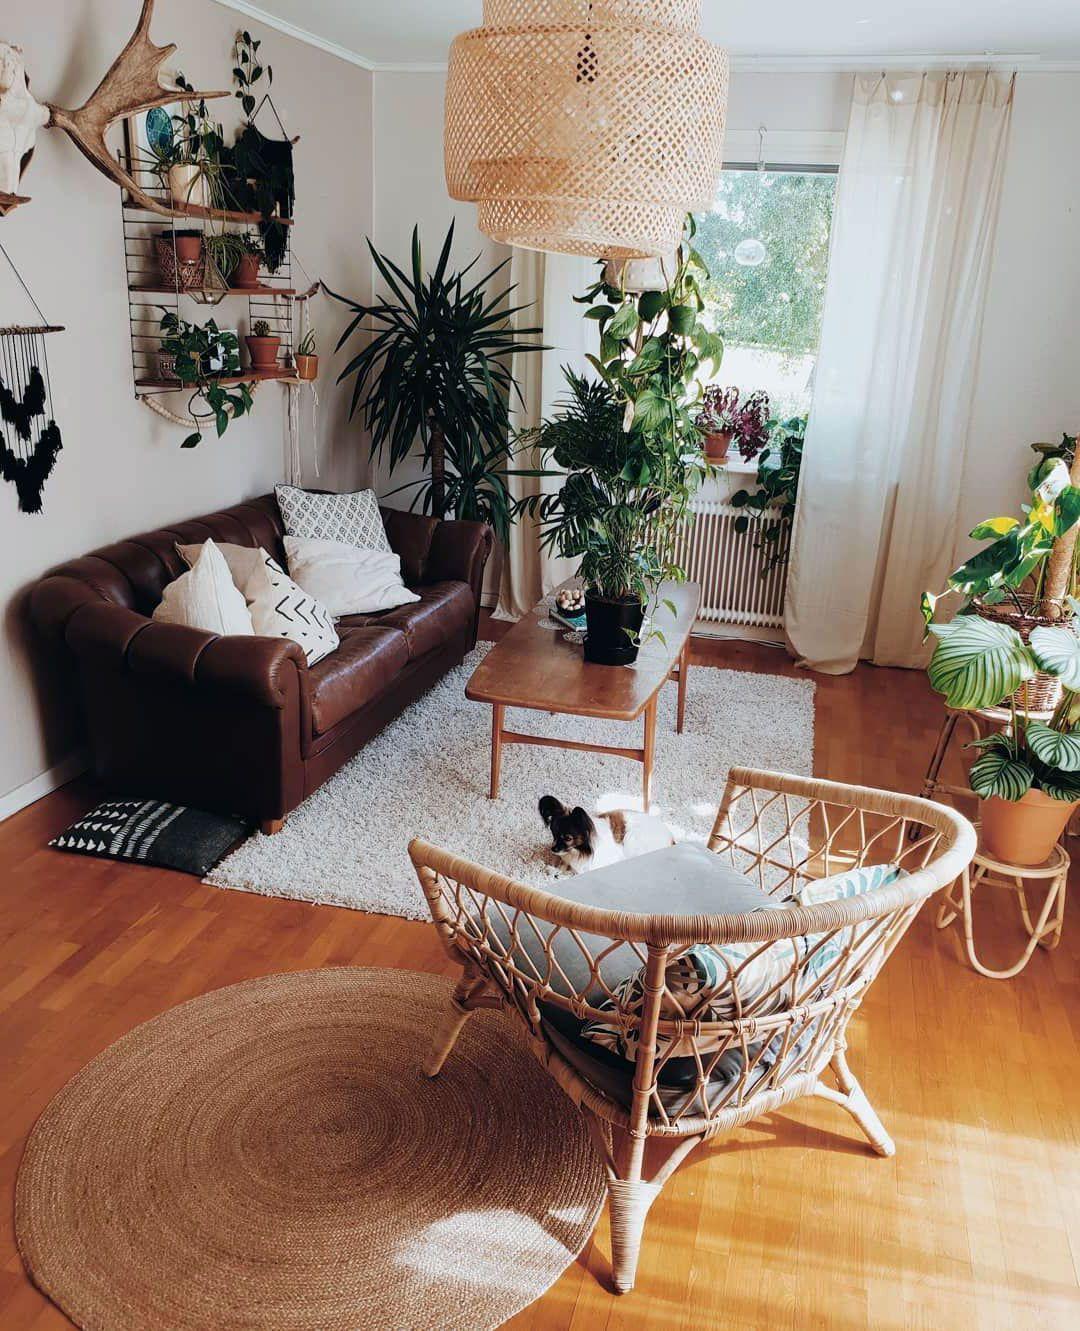 28 Marvelous Scandinavian Living Rooms With Boho Style Ideas Ikea Living Room Earthy Living Room Boho Scandinavian Living Room Small boho living room